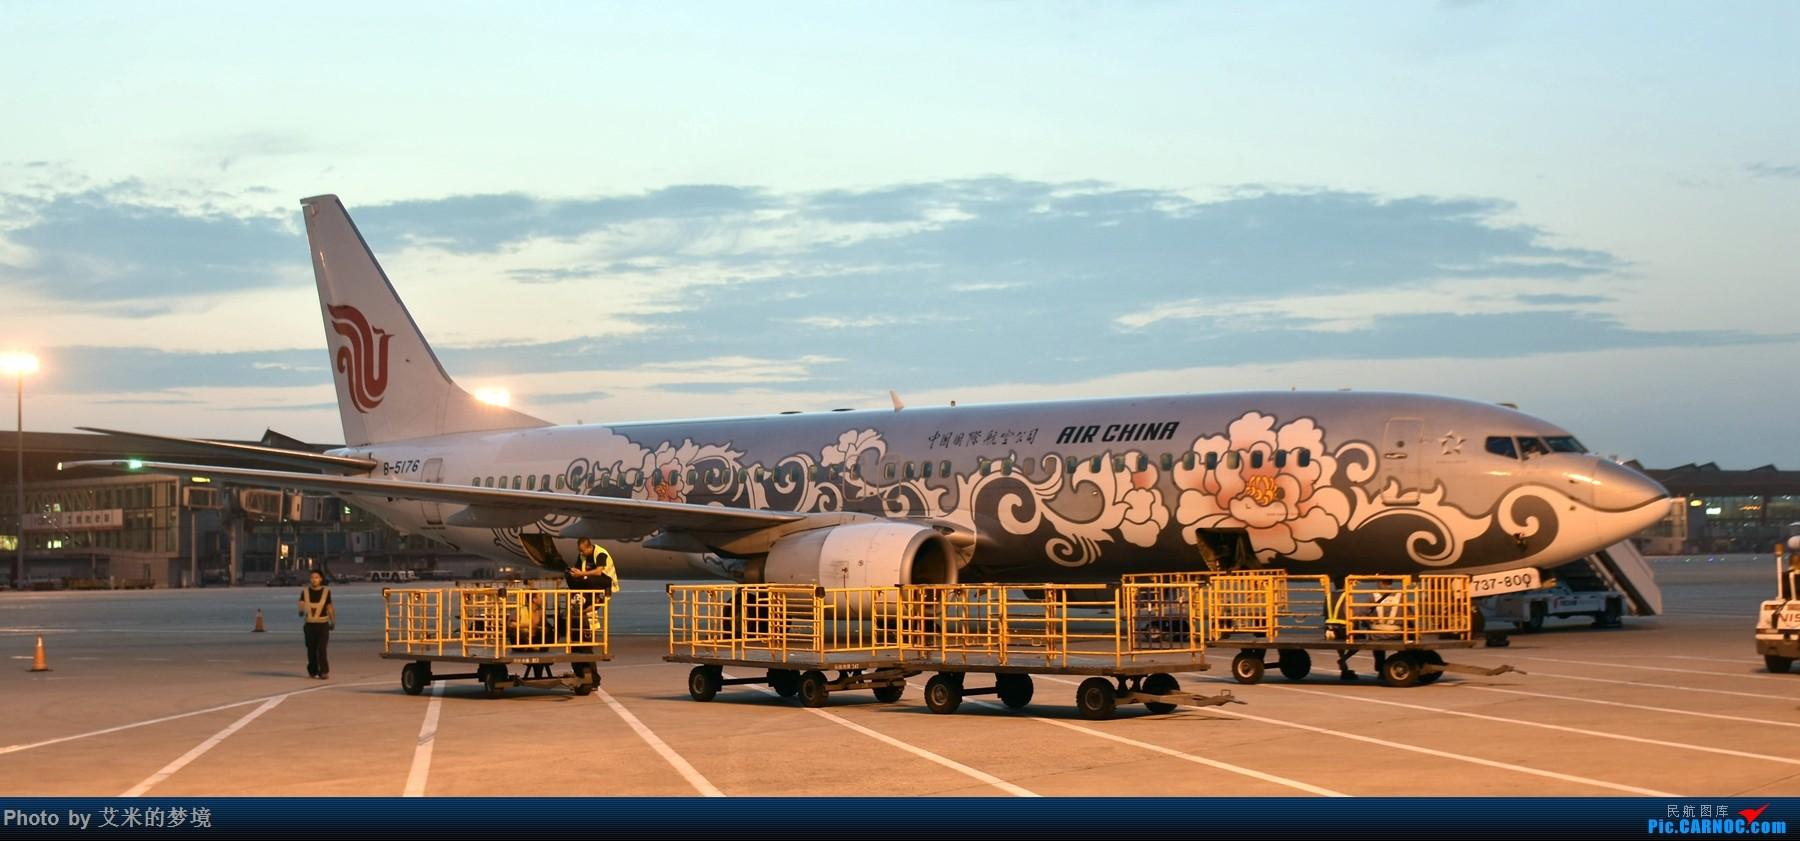 Re:[原创]【carnoc重庆飞友会】北京送行,所见飞行【含少量夜景】 BOEING 737-800 B-5176 中国北京首都国际机场